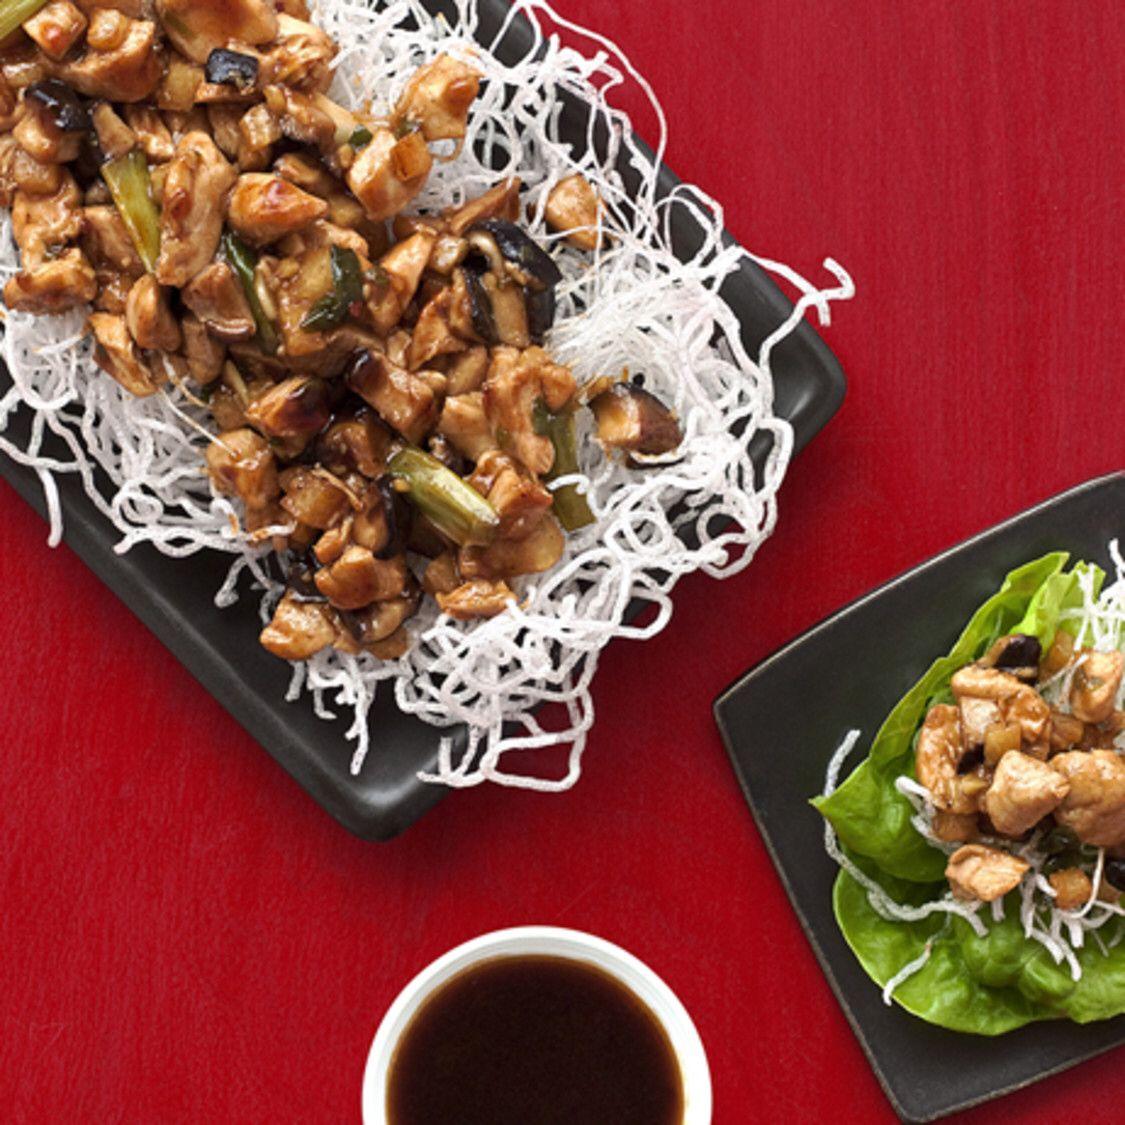 Almost Famous Chicken Lettuce Wraps Recipe In 2020 Chicken Lettuce Wraps Lettuce Wraps Lettuce Wrap Recipes